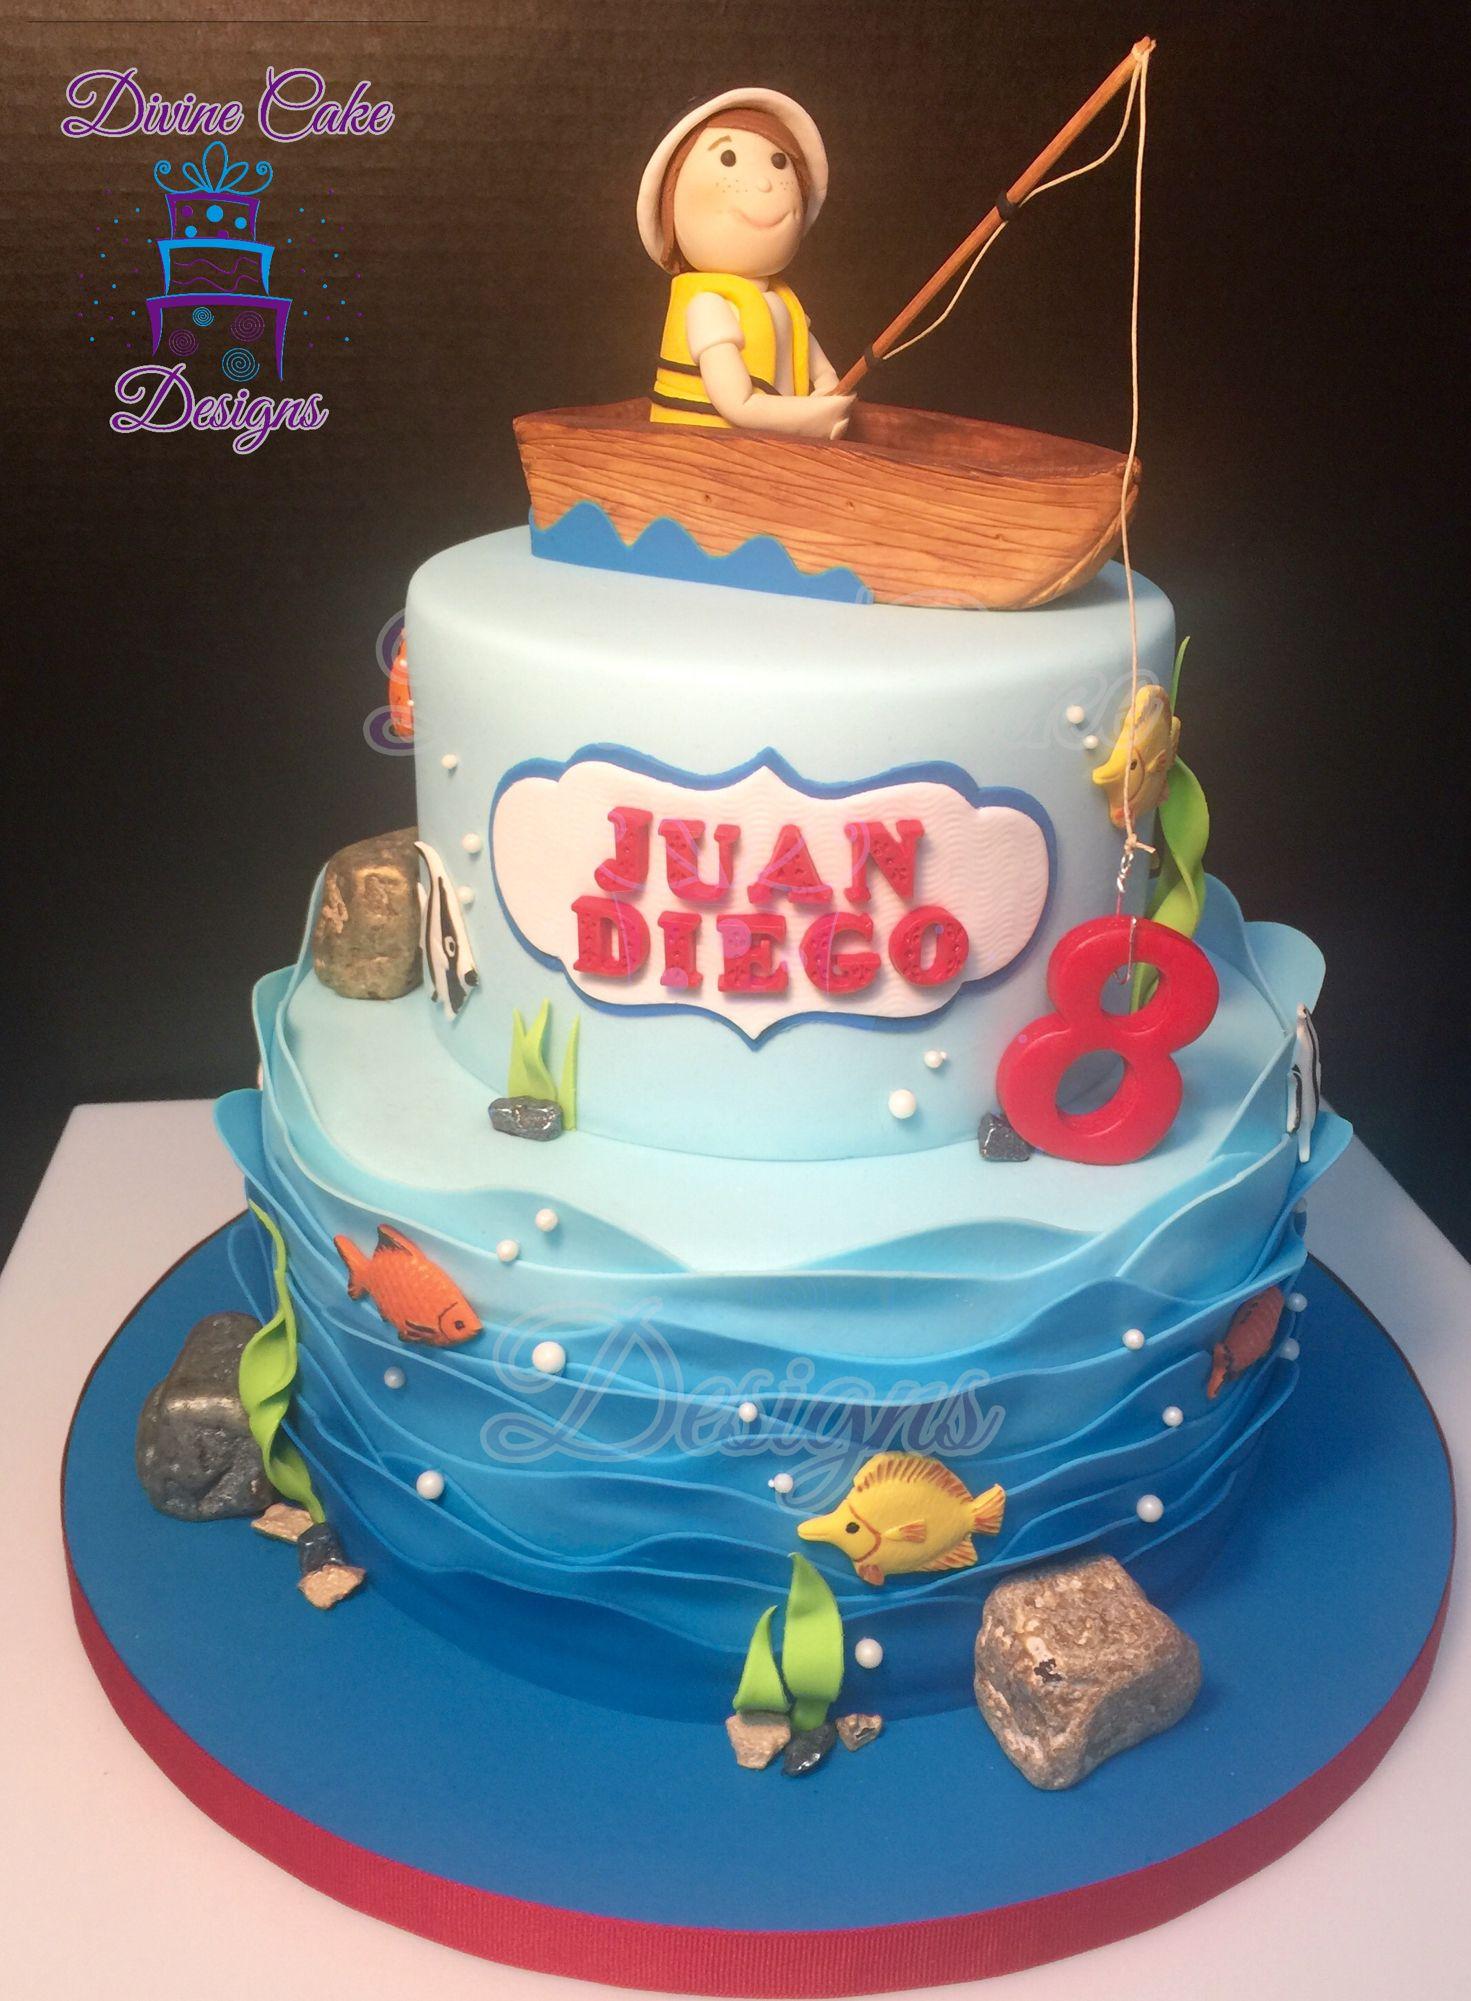 Fishing Cake Ideas  Inspirations Fishing Boats Birthday Cakes - Fishing boat birthday cake